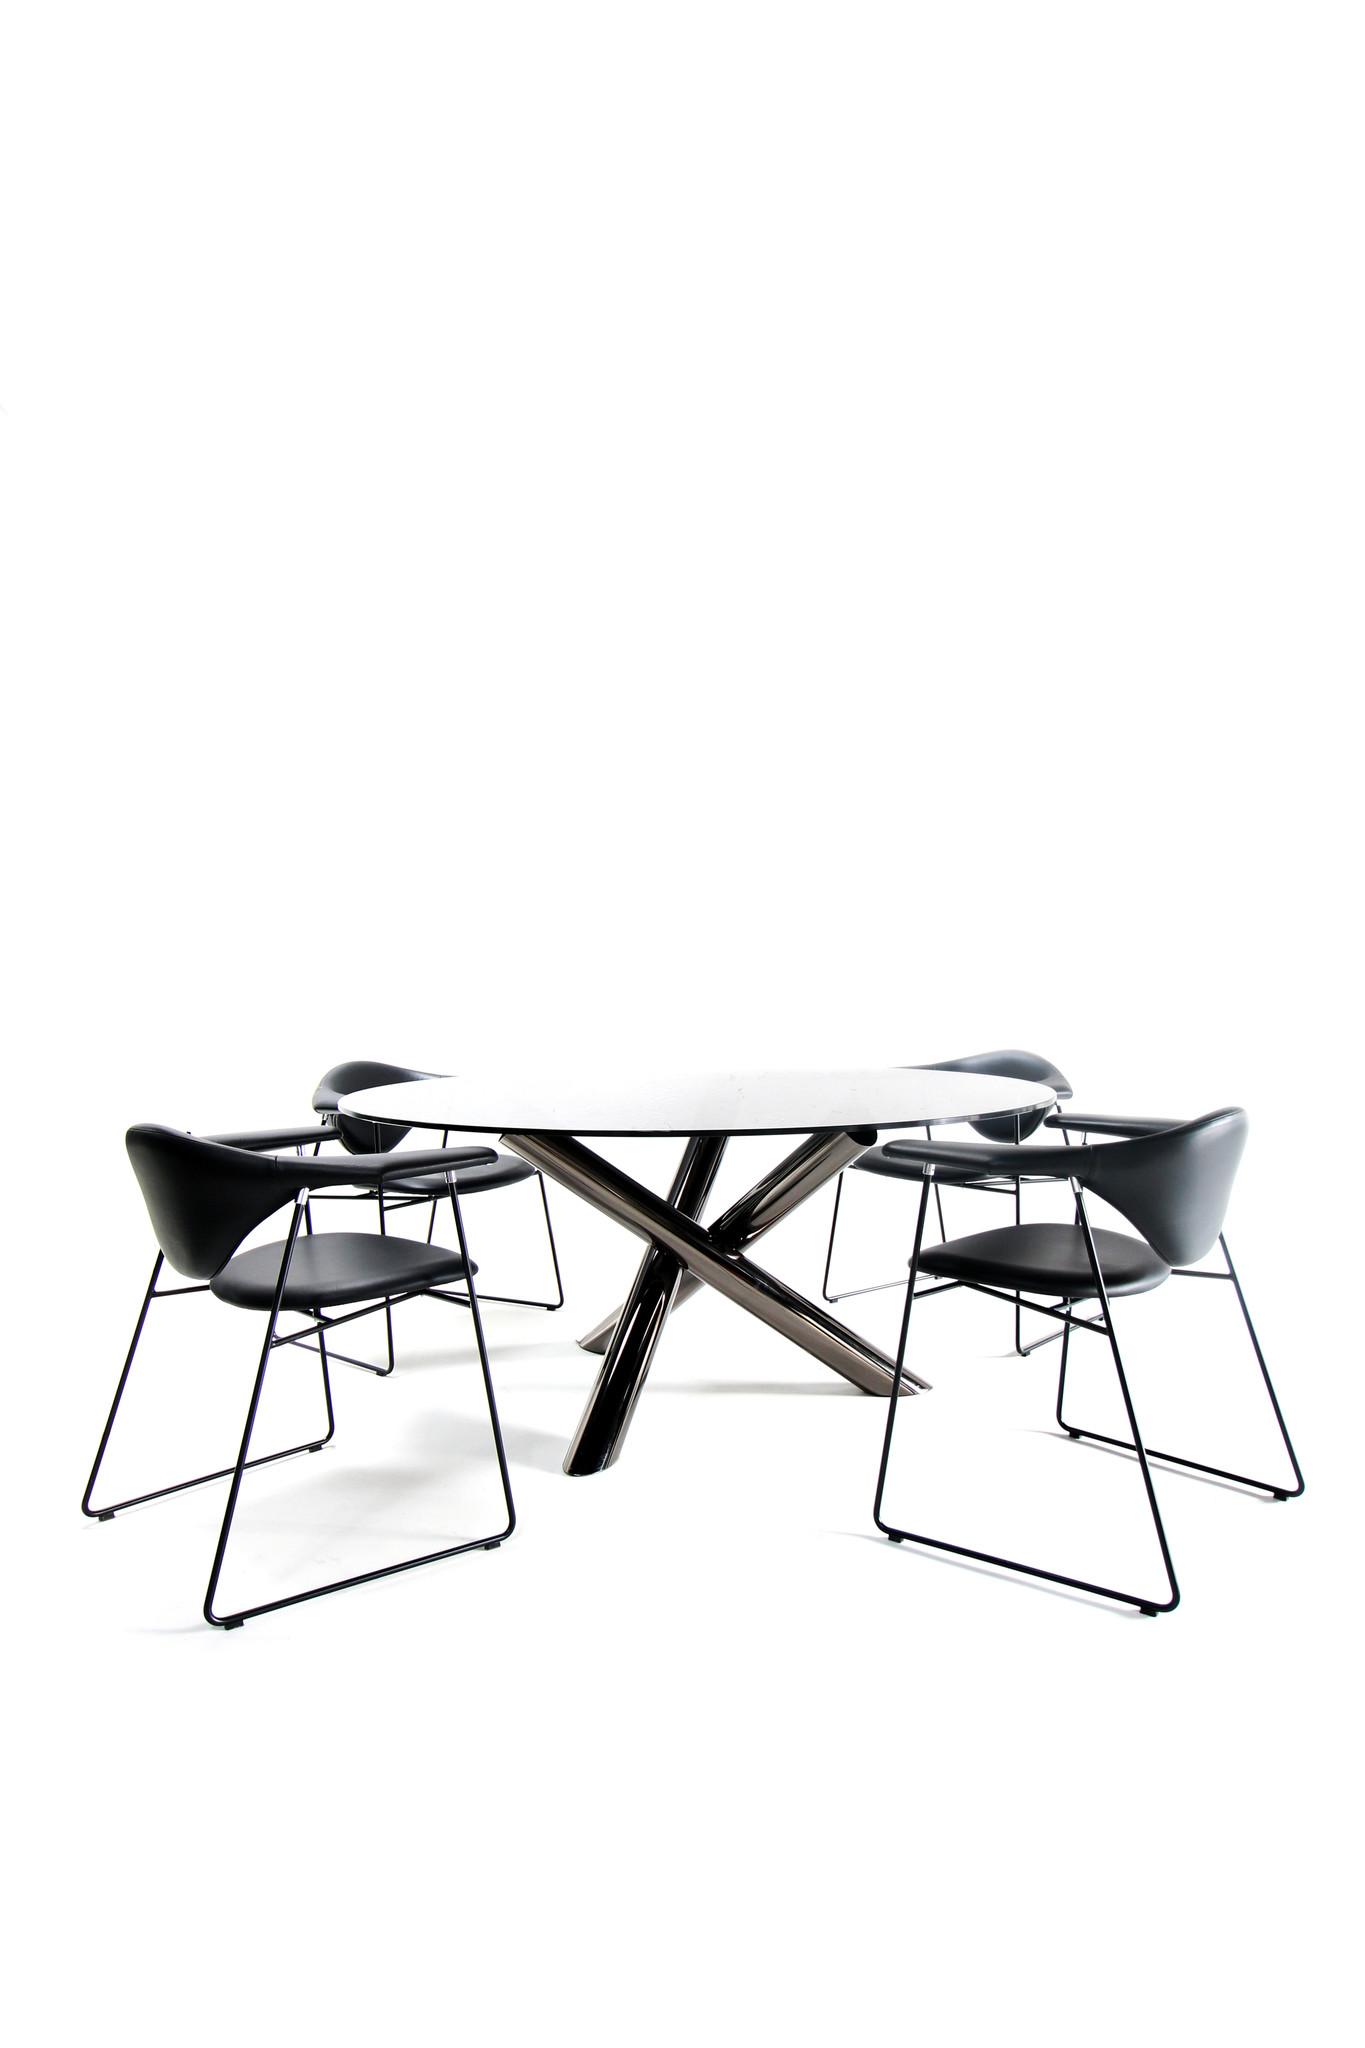 Masculo armchair by Gamfratesi for Gubi